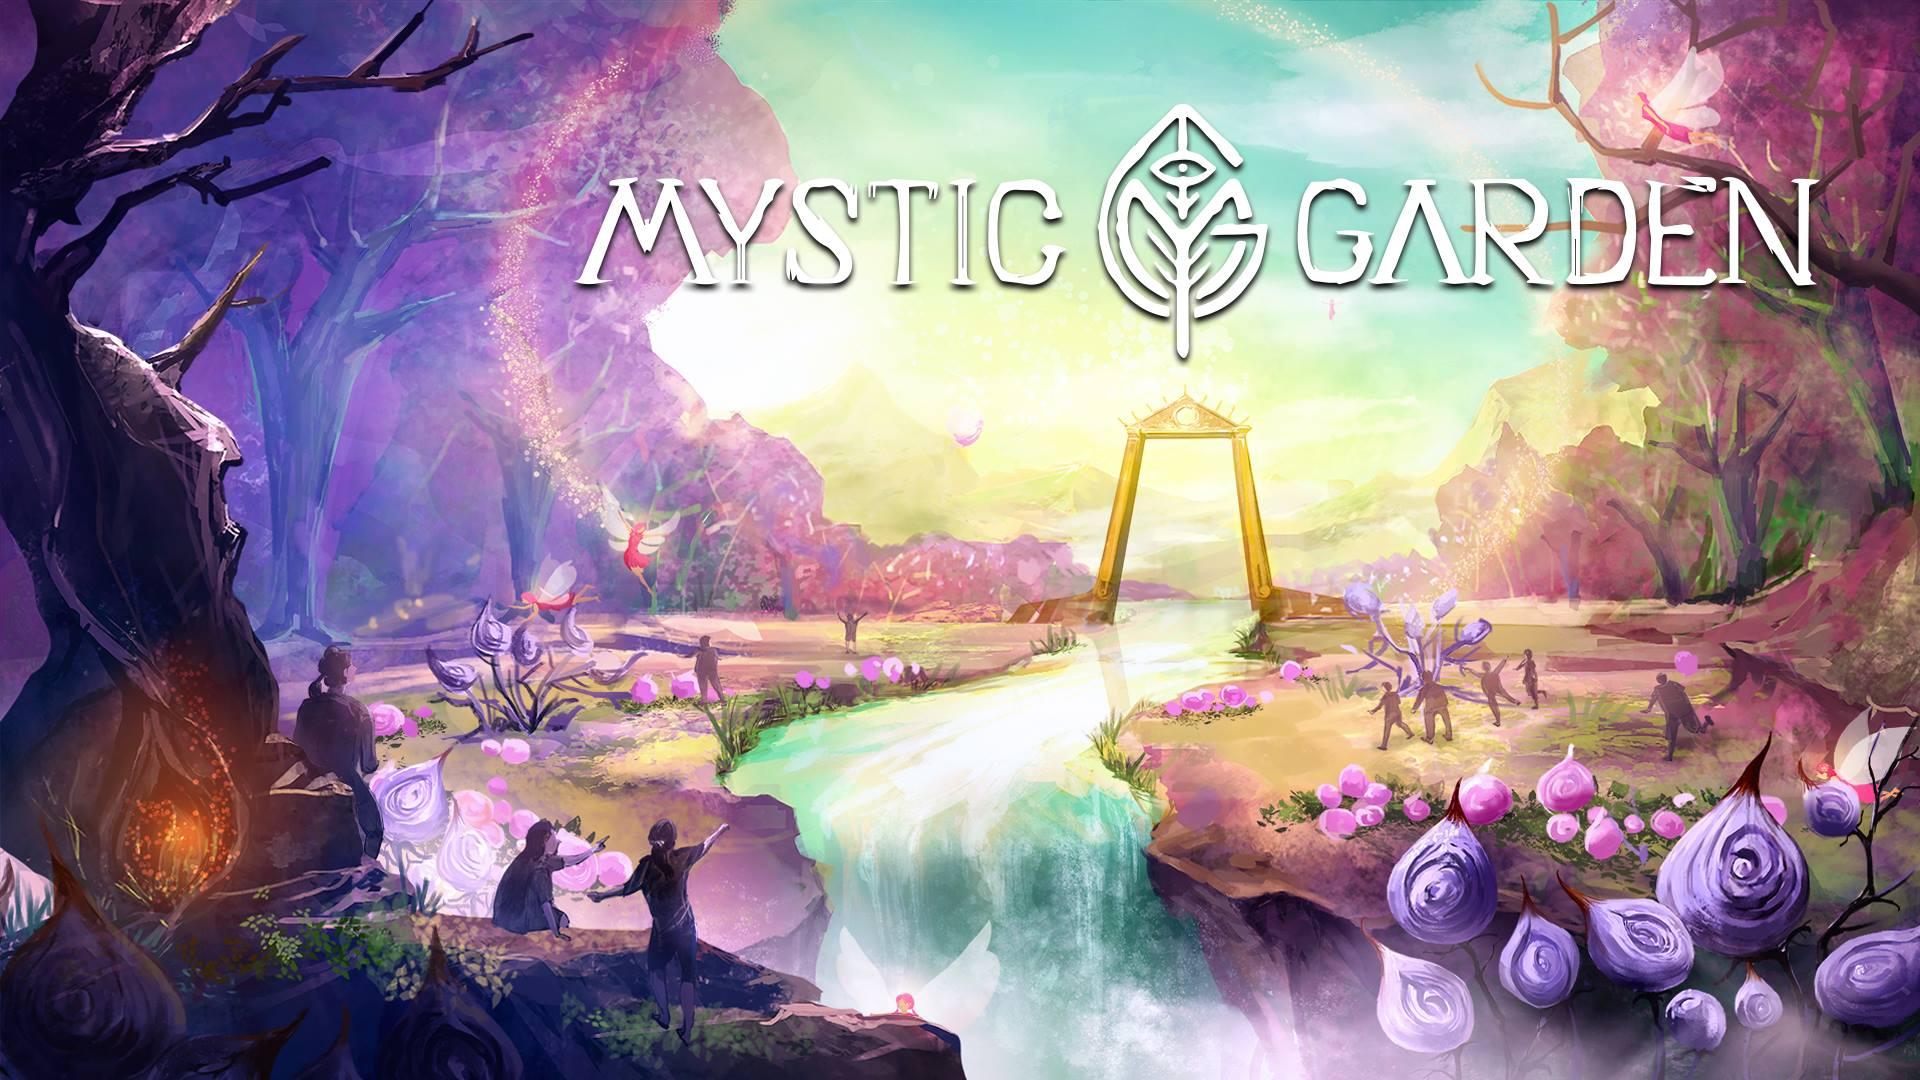 Mystic Garden Festival 2019